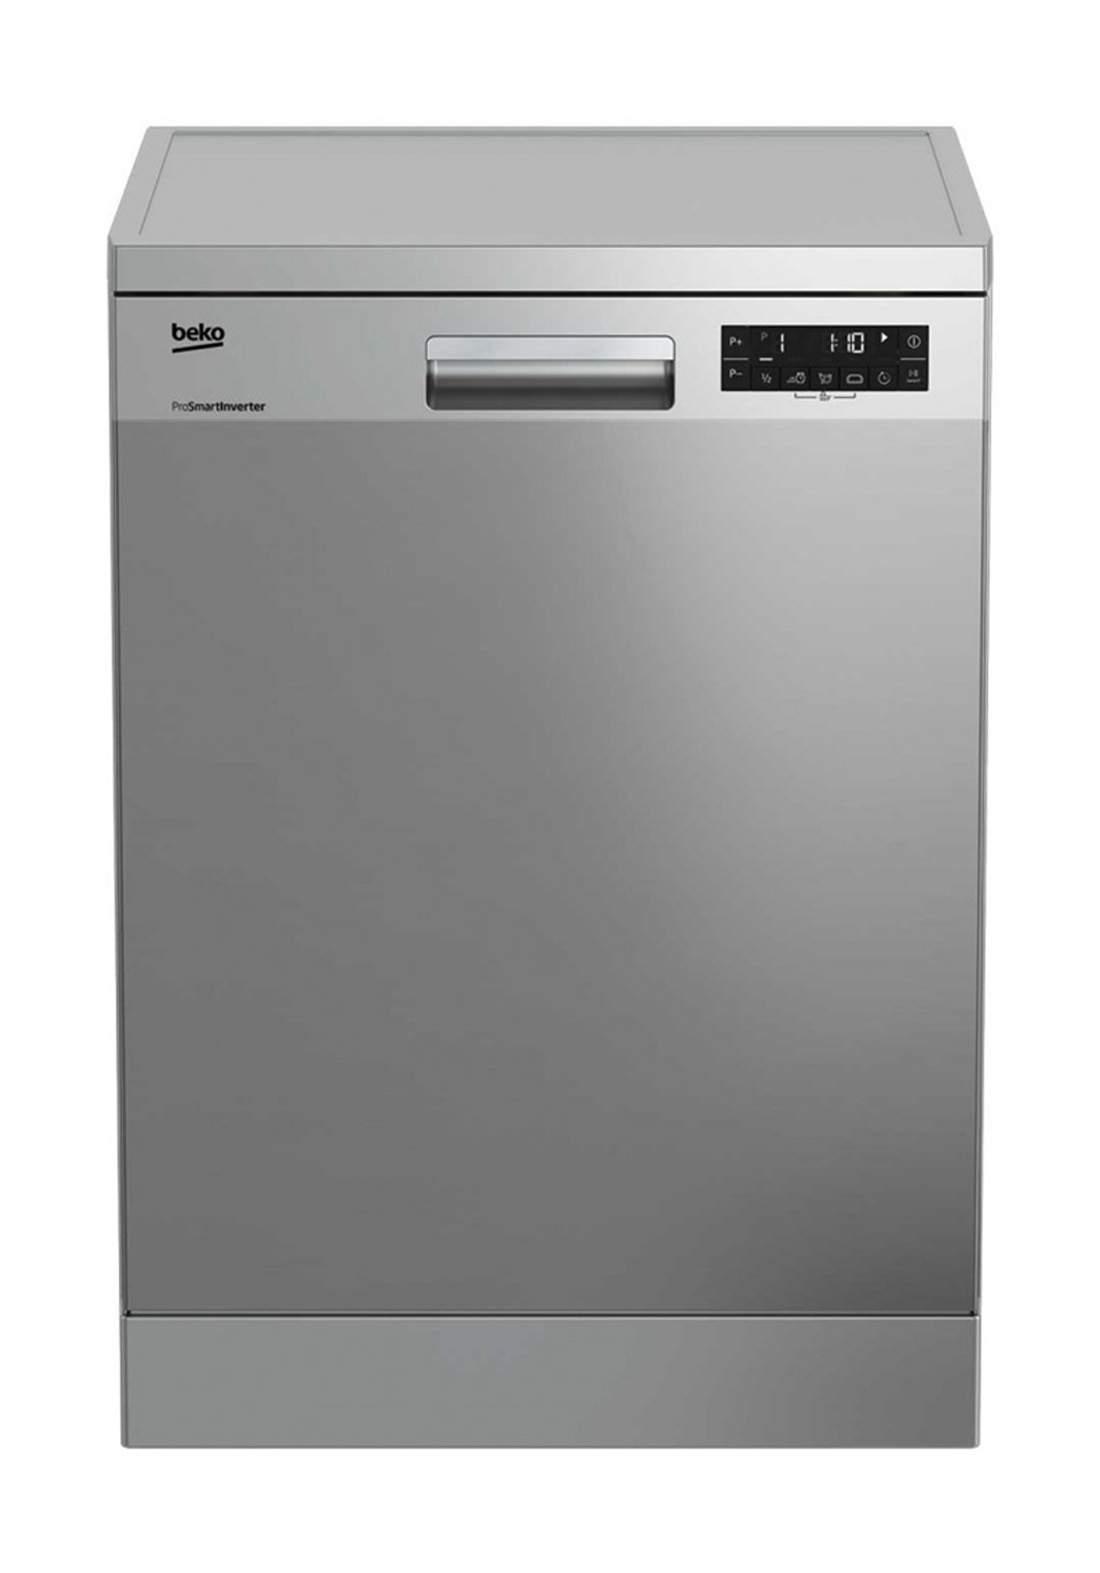 Beko DFN 28424X Dishwasher 8 Programs Capacity Of 14 Sets - Gray  غسالة صحون